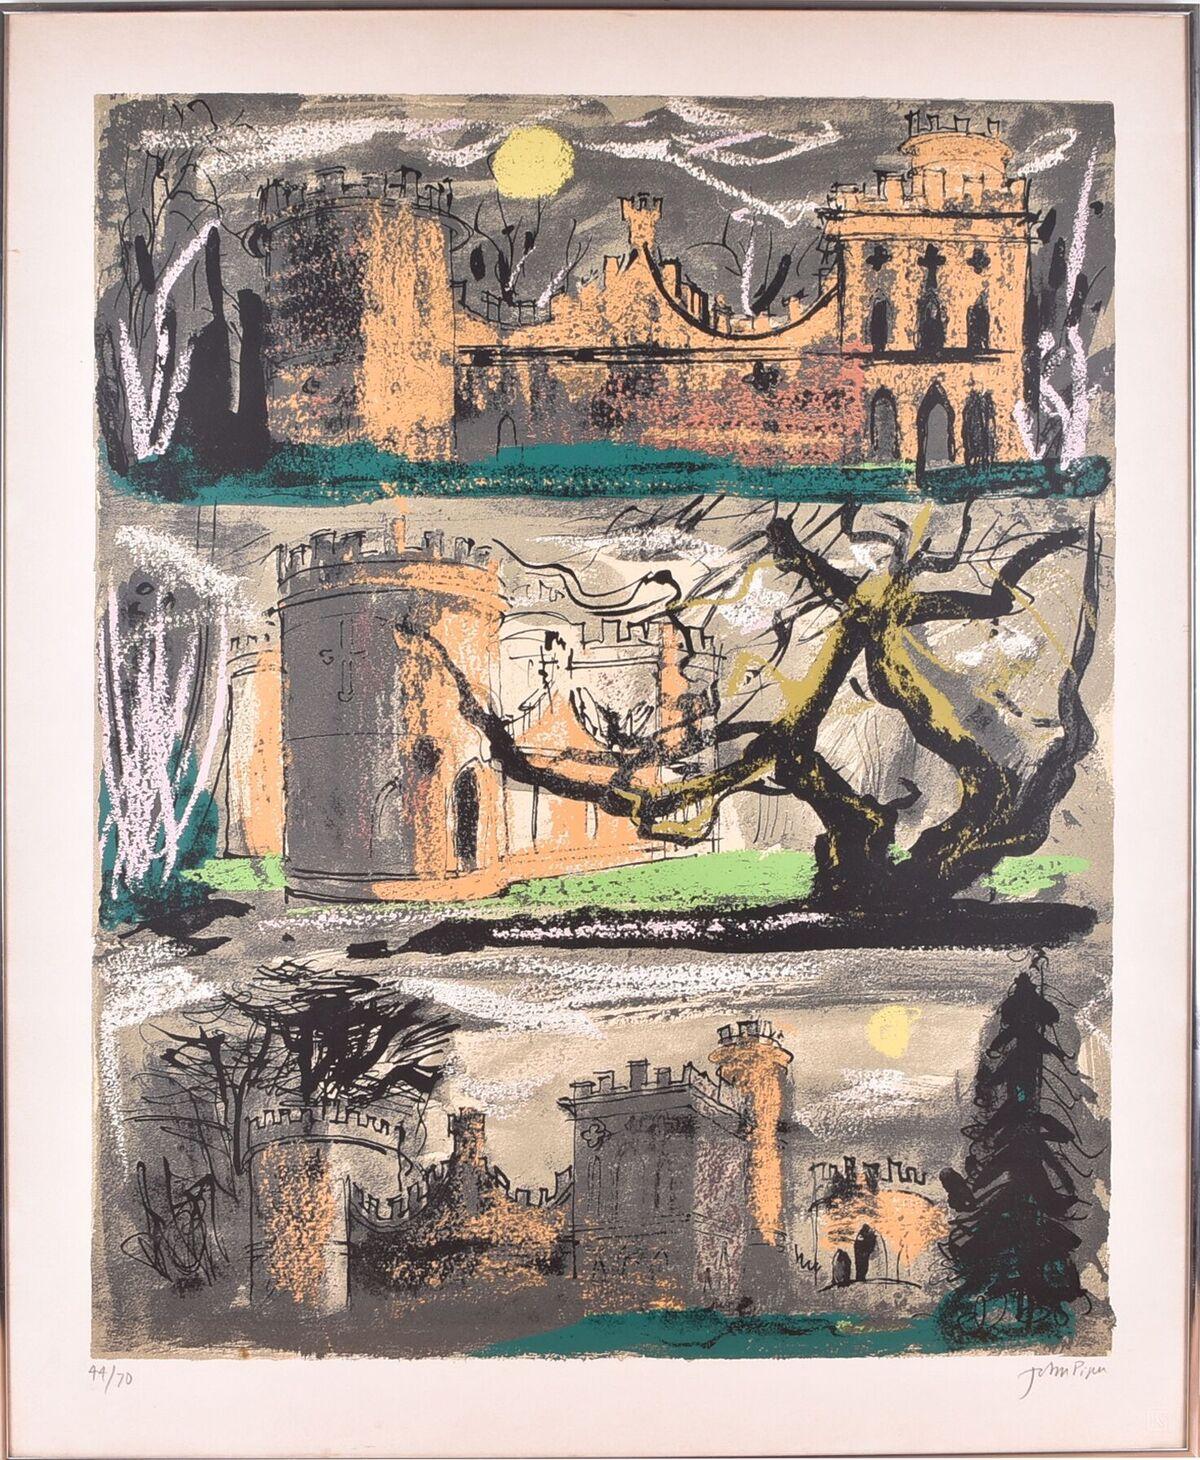 Lot 137: John Piper (1903-1992) British, Clytha Castle